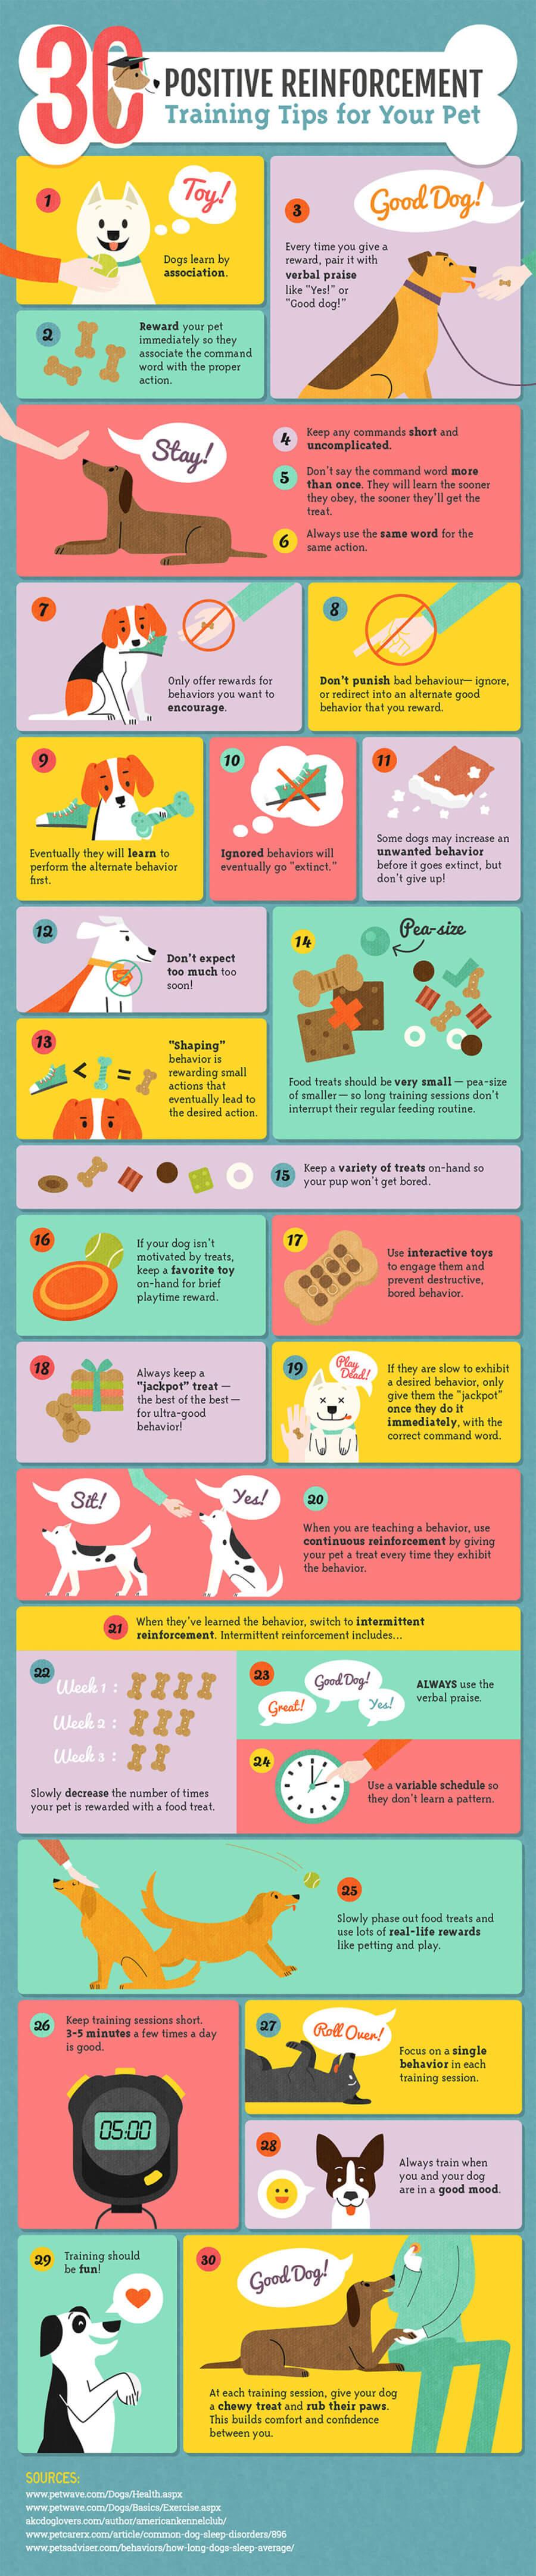 Infographic: Positive Reinforcement Pet Training Tips